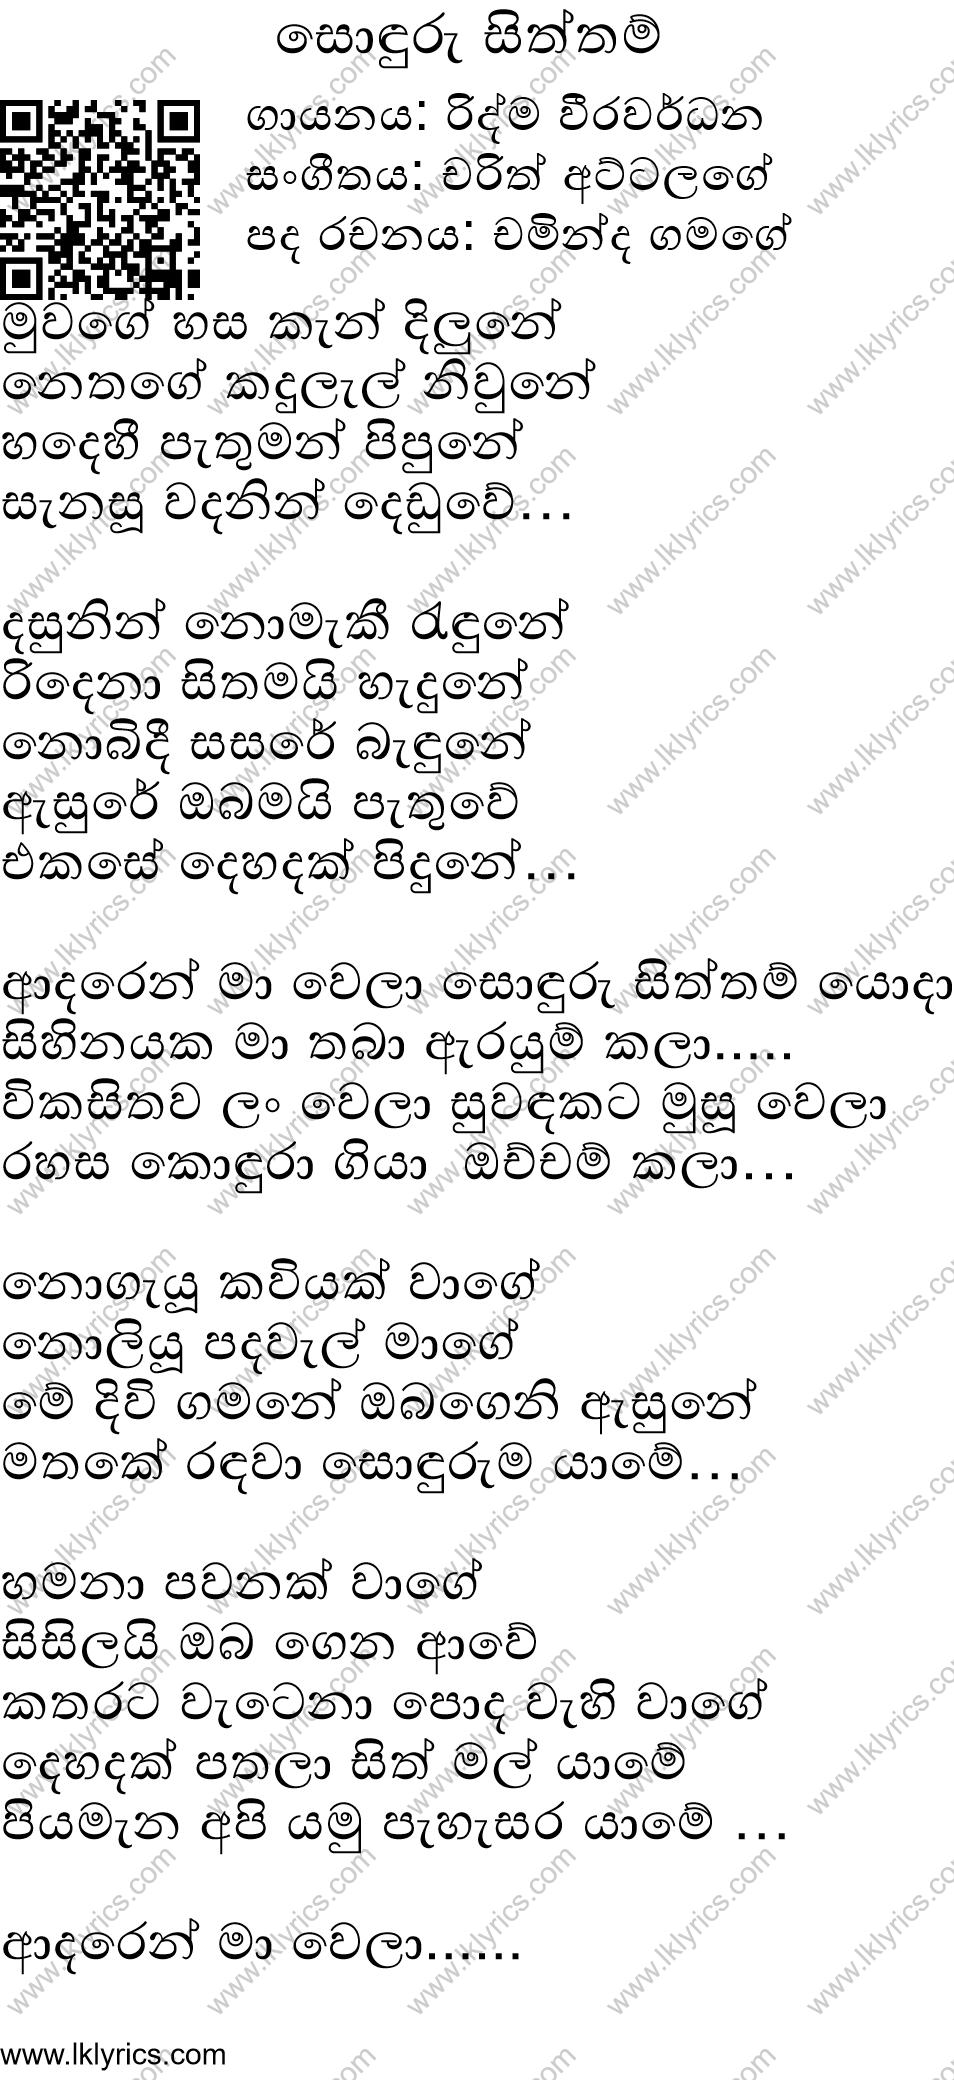 Sonduru Siththam Lyrics Lk Lyrics